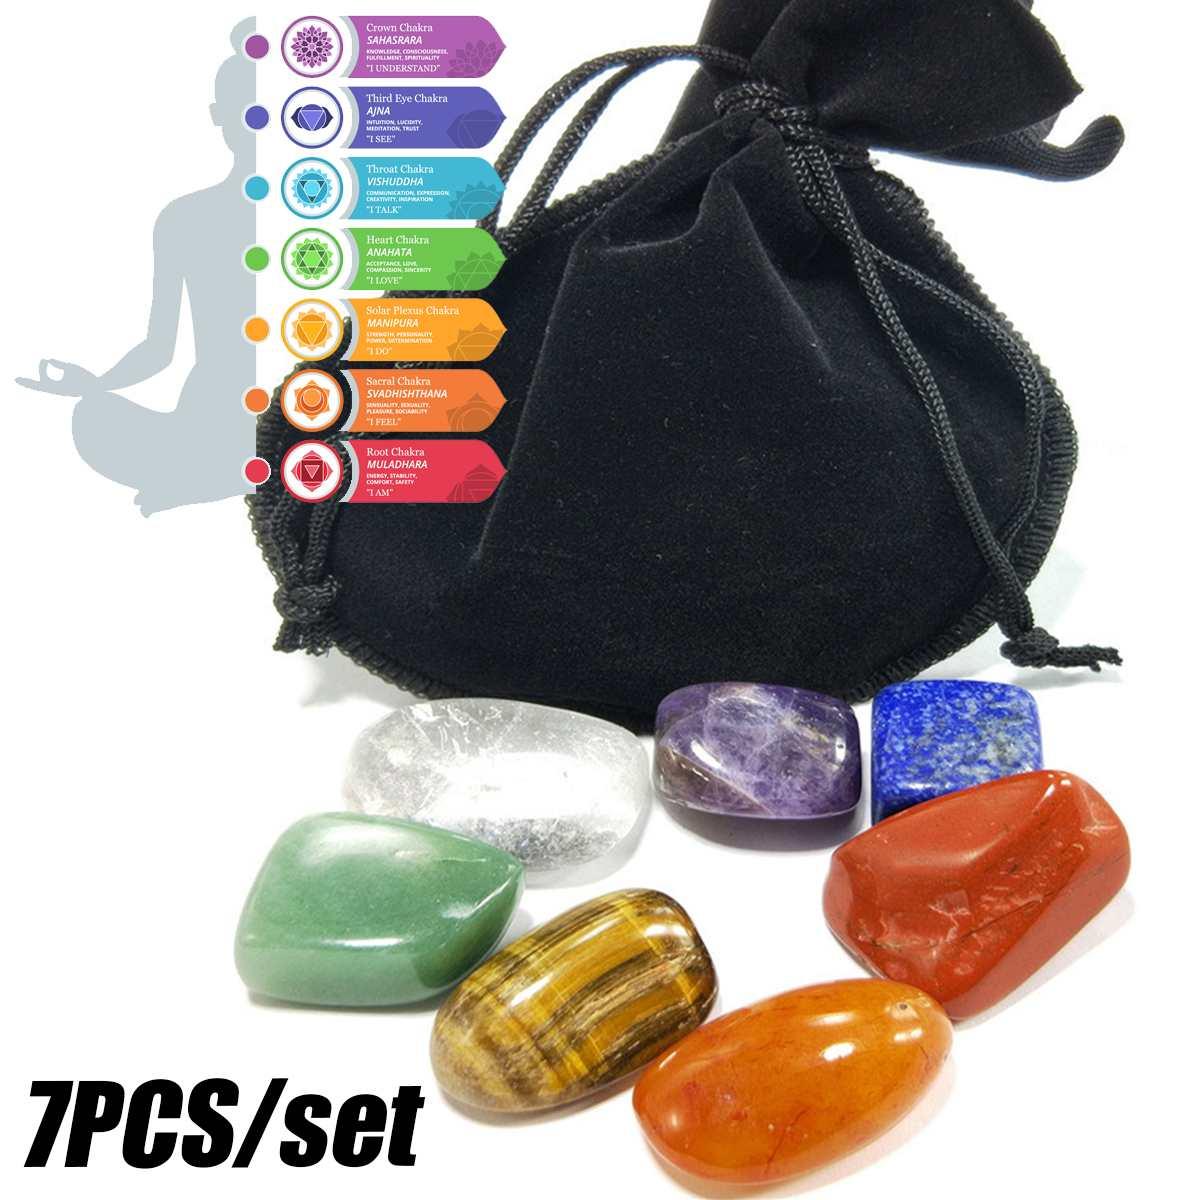 Seven Chakra Stone 7 Colors Set Yoga Chakra Irregular Reiki Healing Crystals Stone Polished Individual Stones With Bag